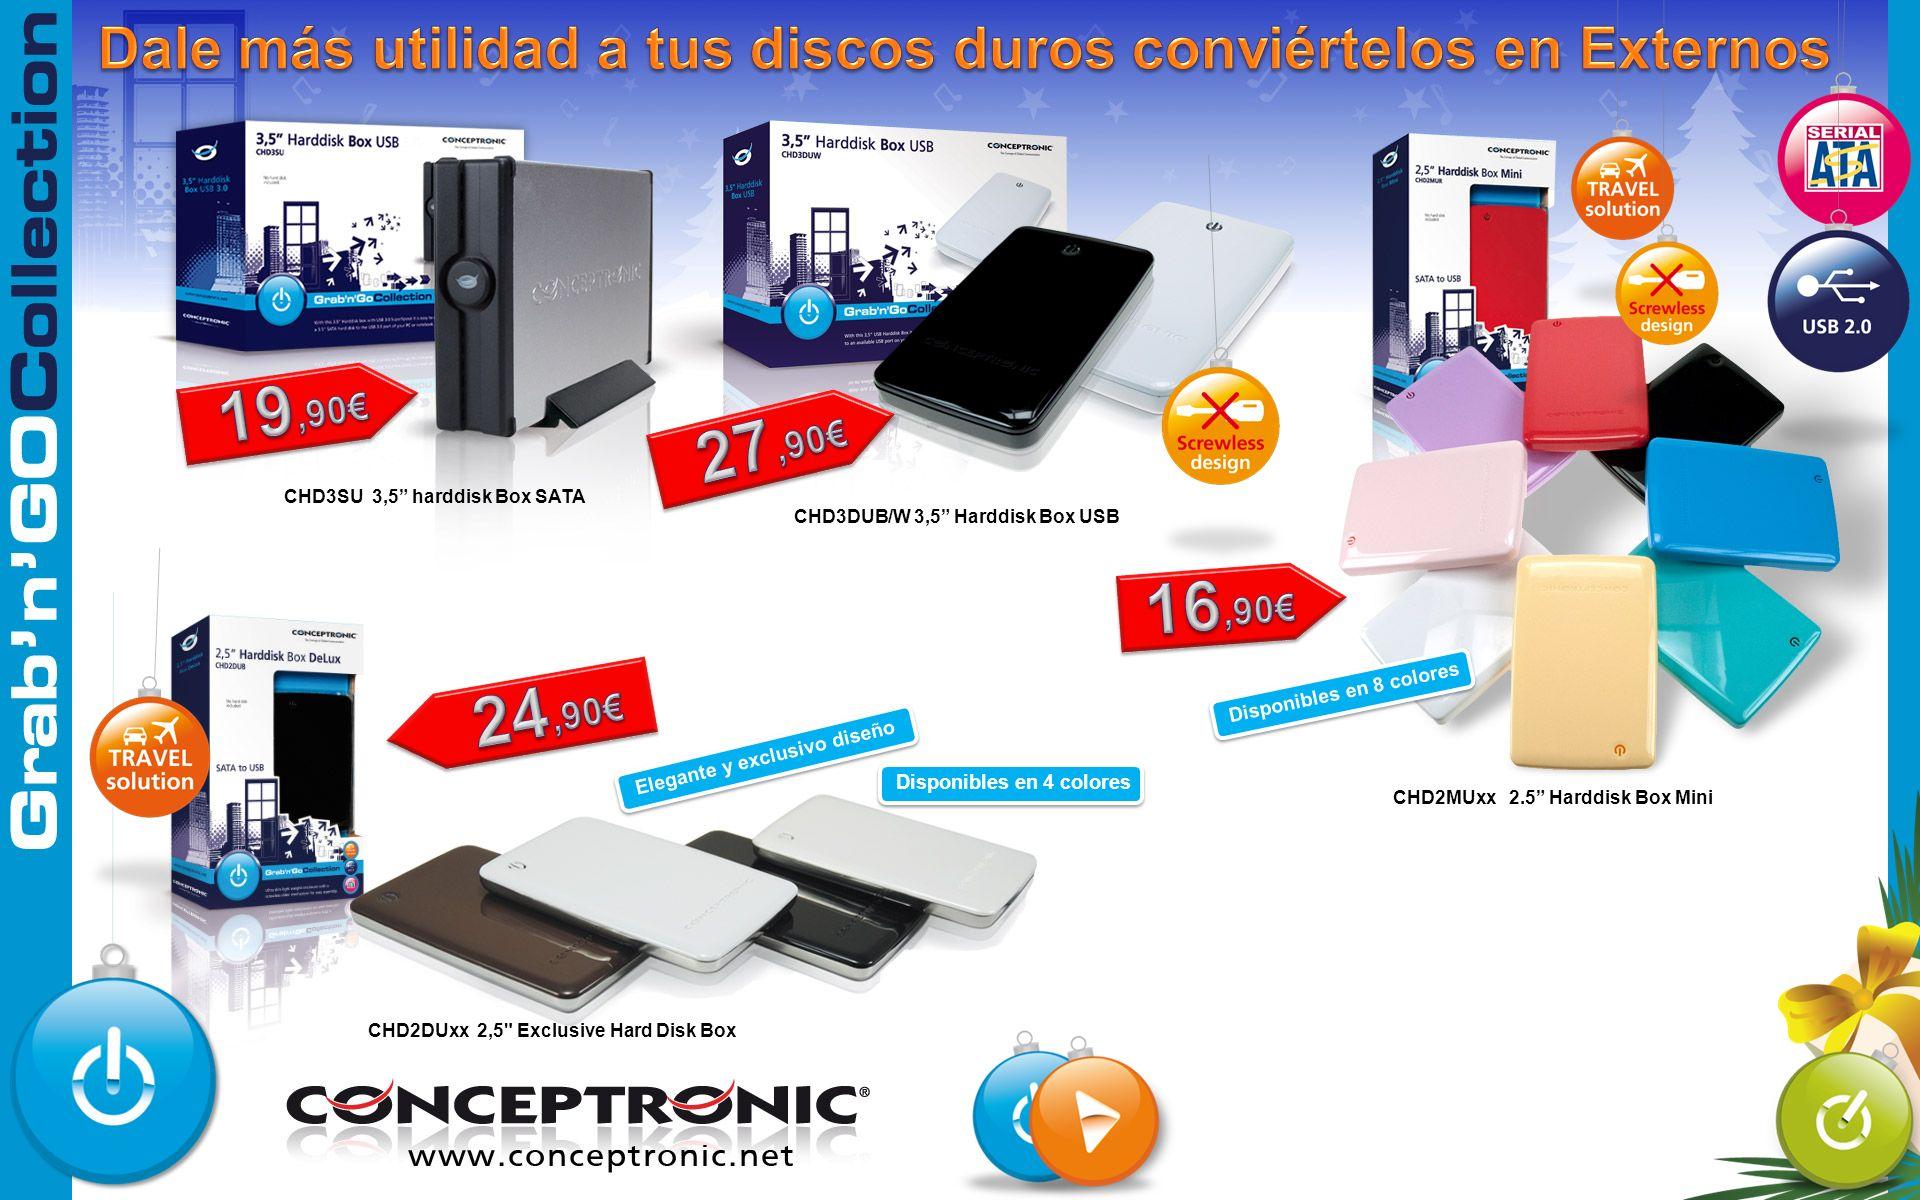 CHD3SU 3,5 harddisk Box SATA CHD3DUB/W 3,5 Harddisk Box USB CHD2DUxx 2,5